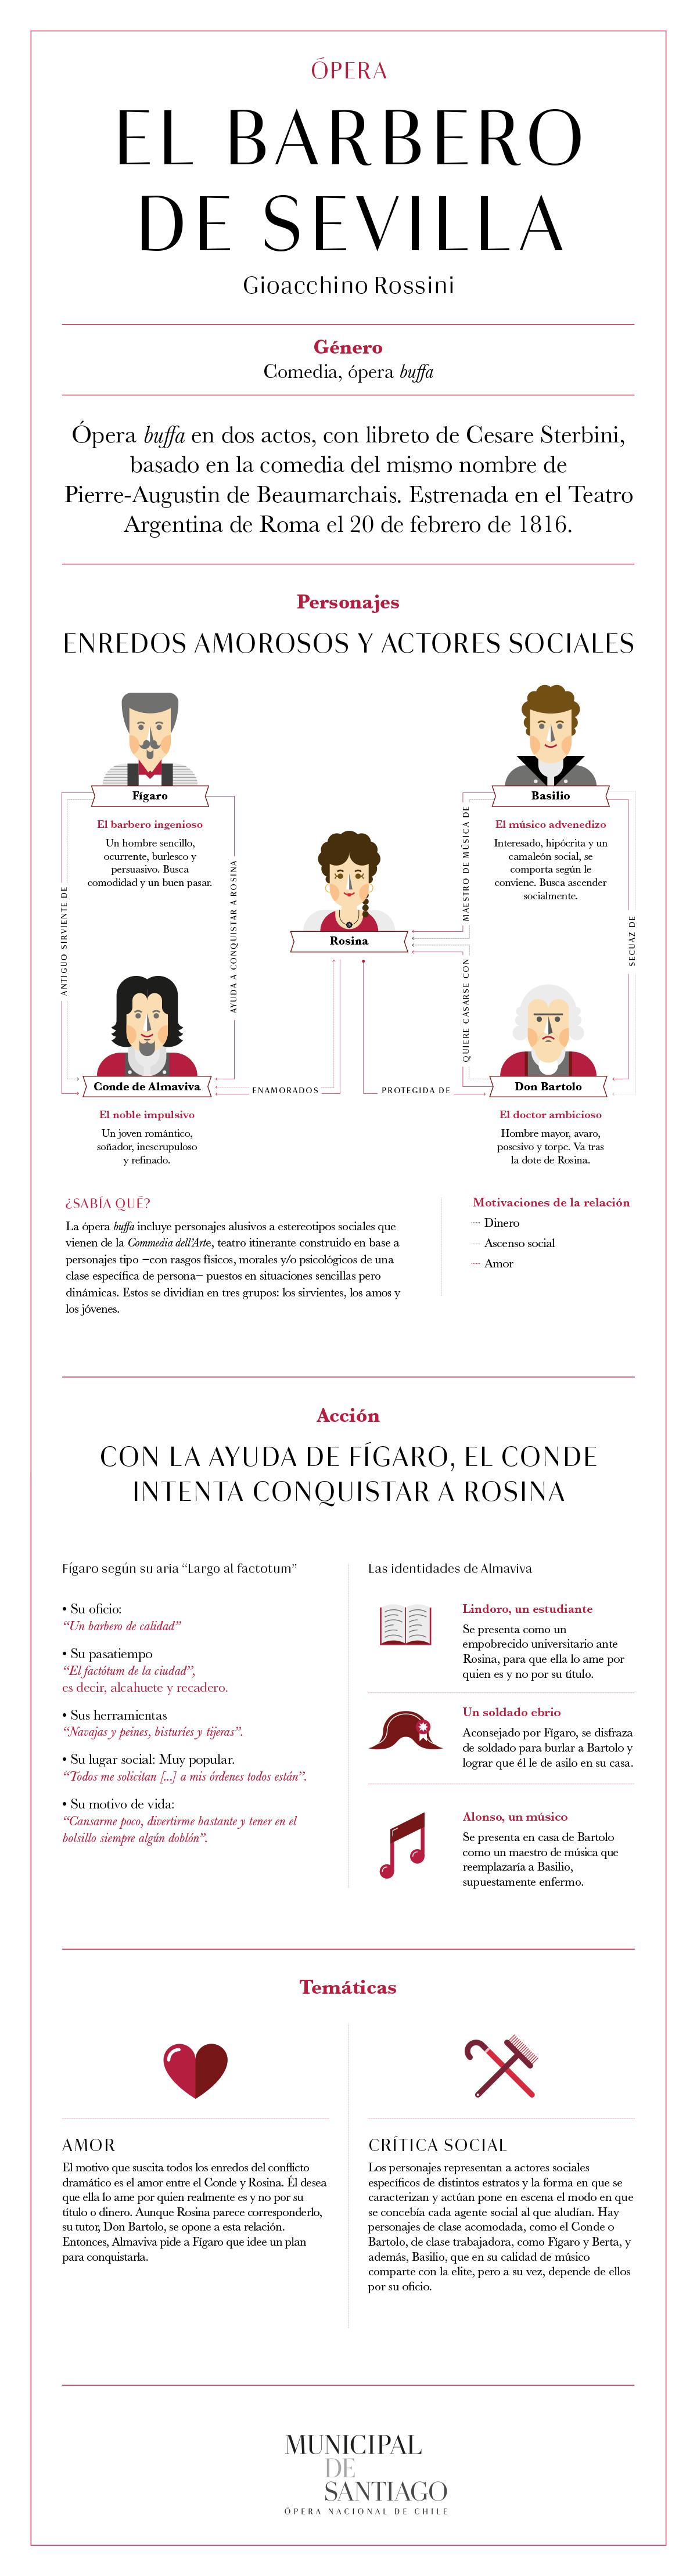 El barbero de Sevilla, argumento, infografía, ópera, Municipal de Santiago